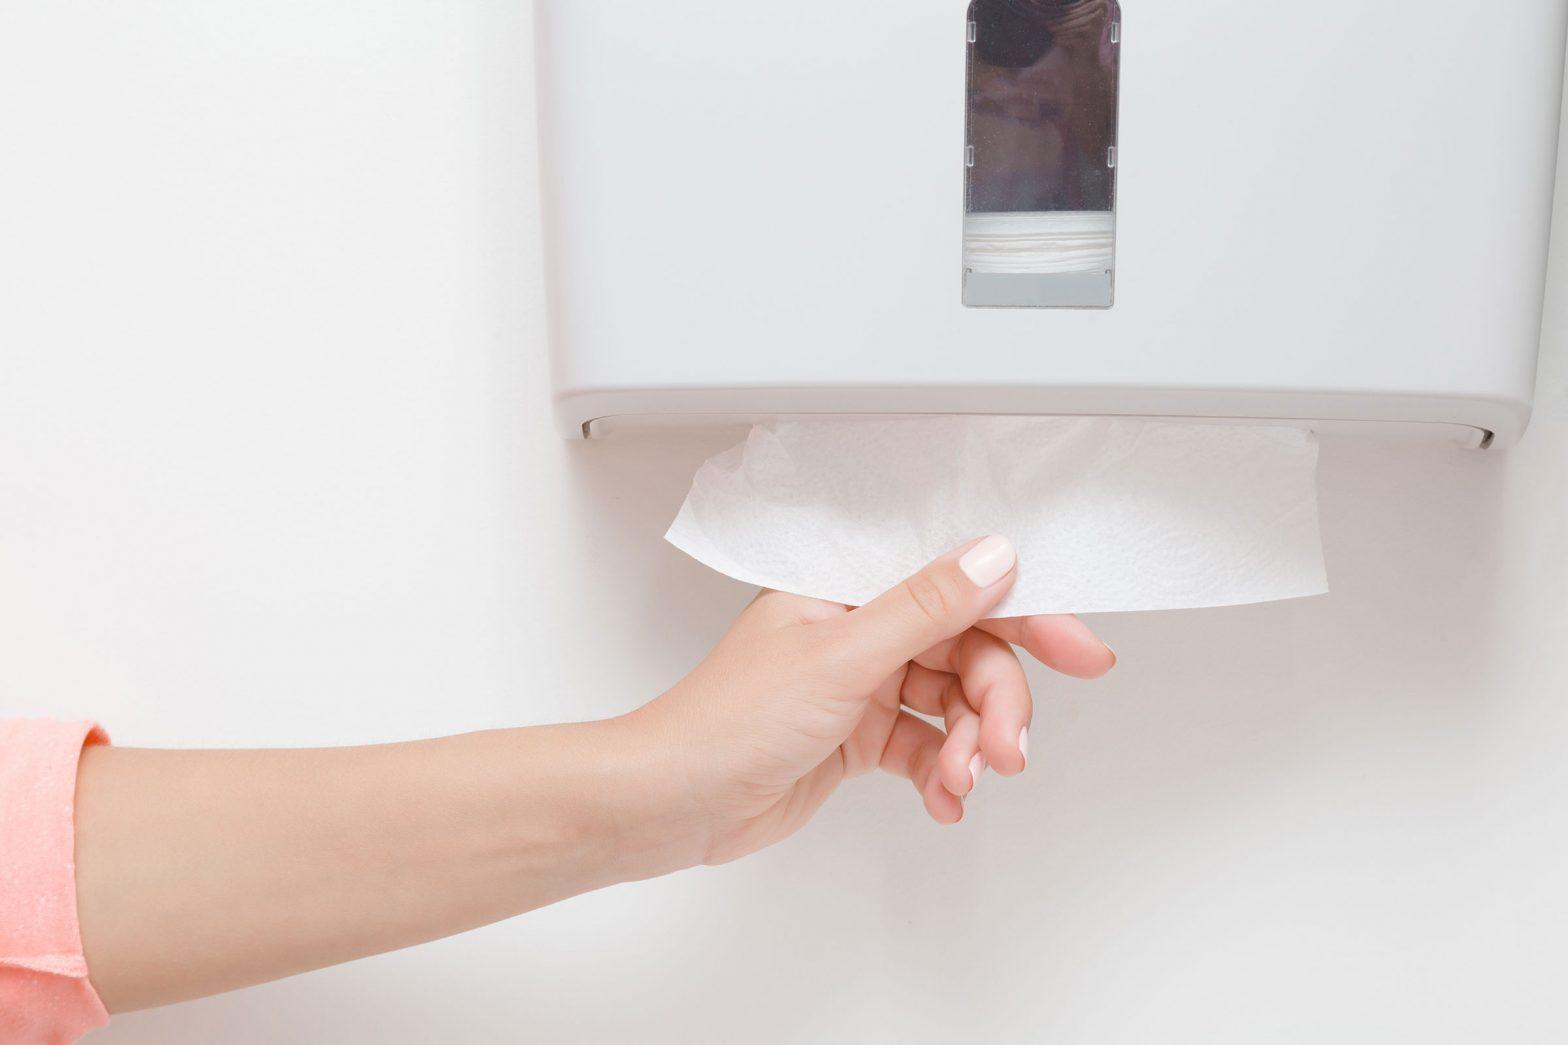 memilih tissue hand towel harga terbaik surabaya